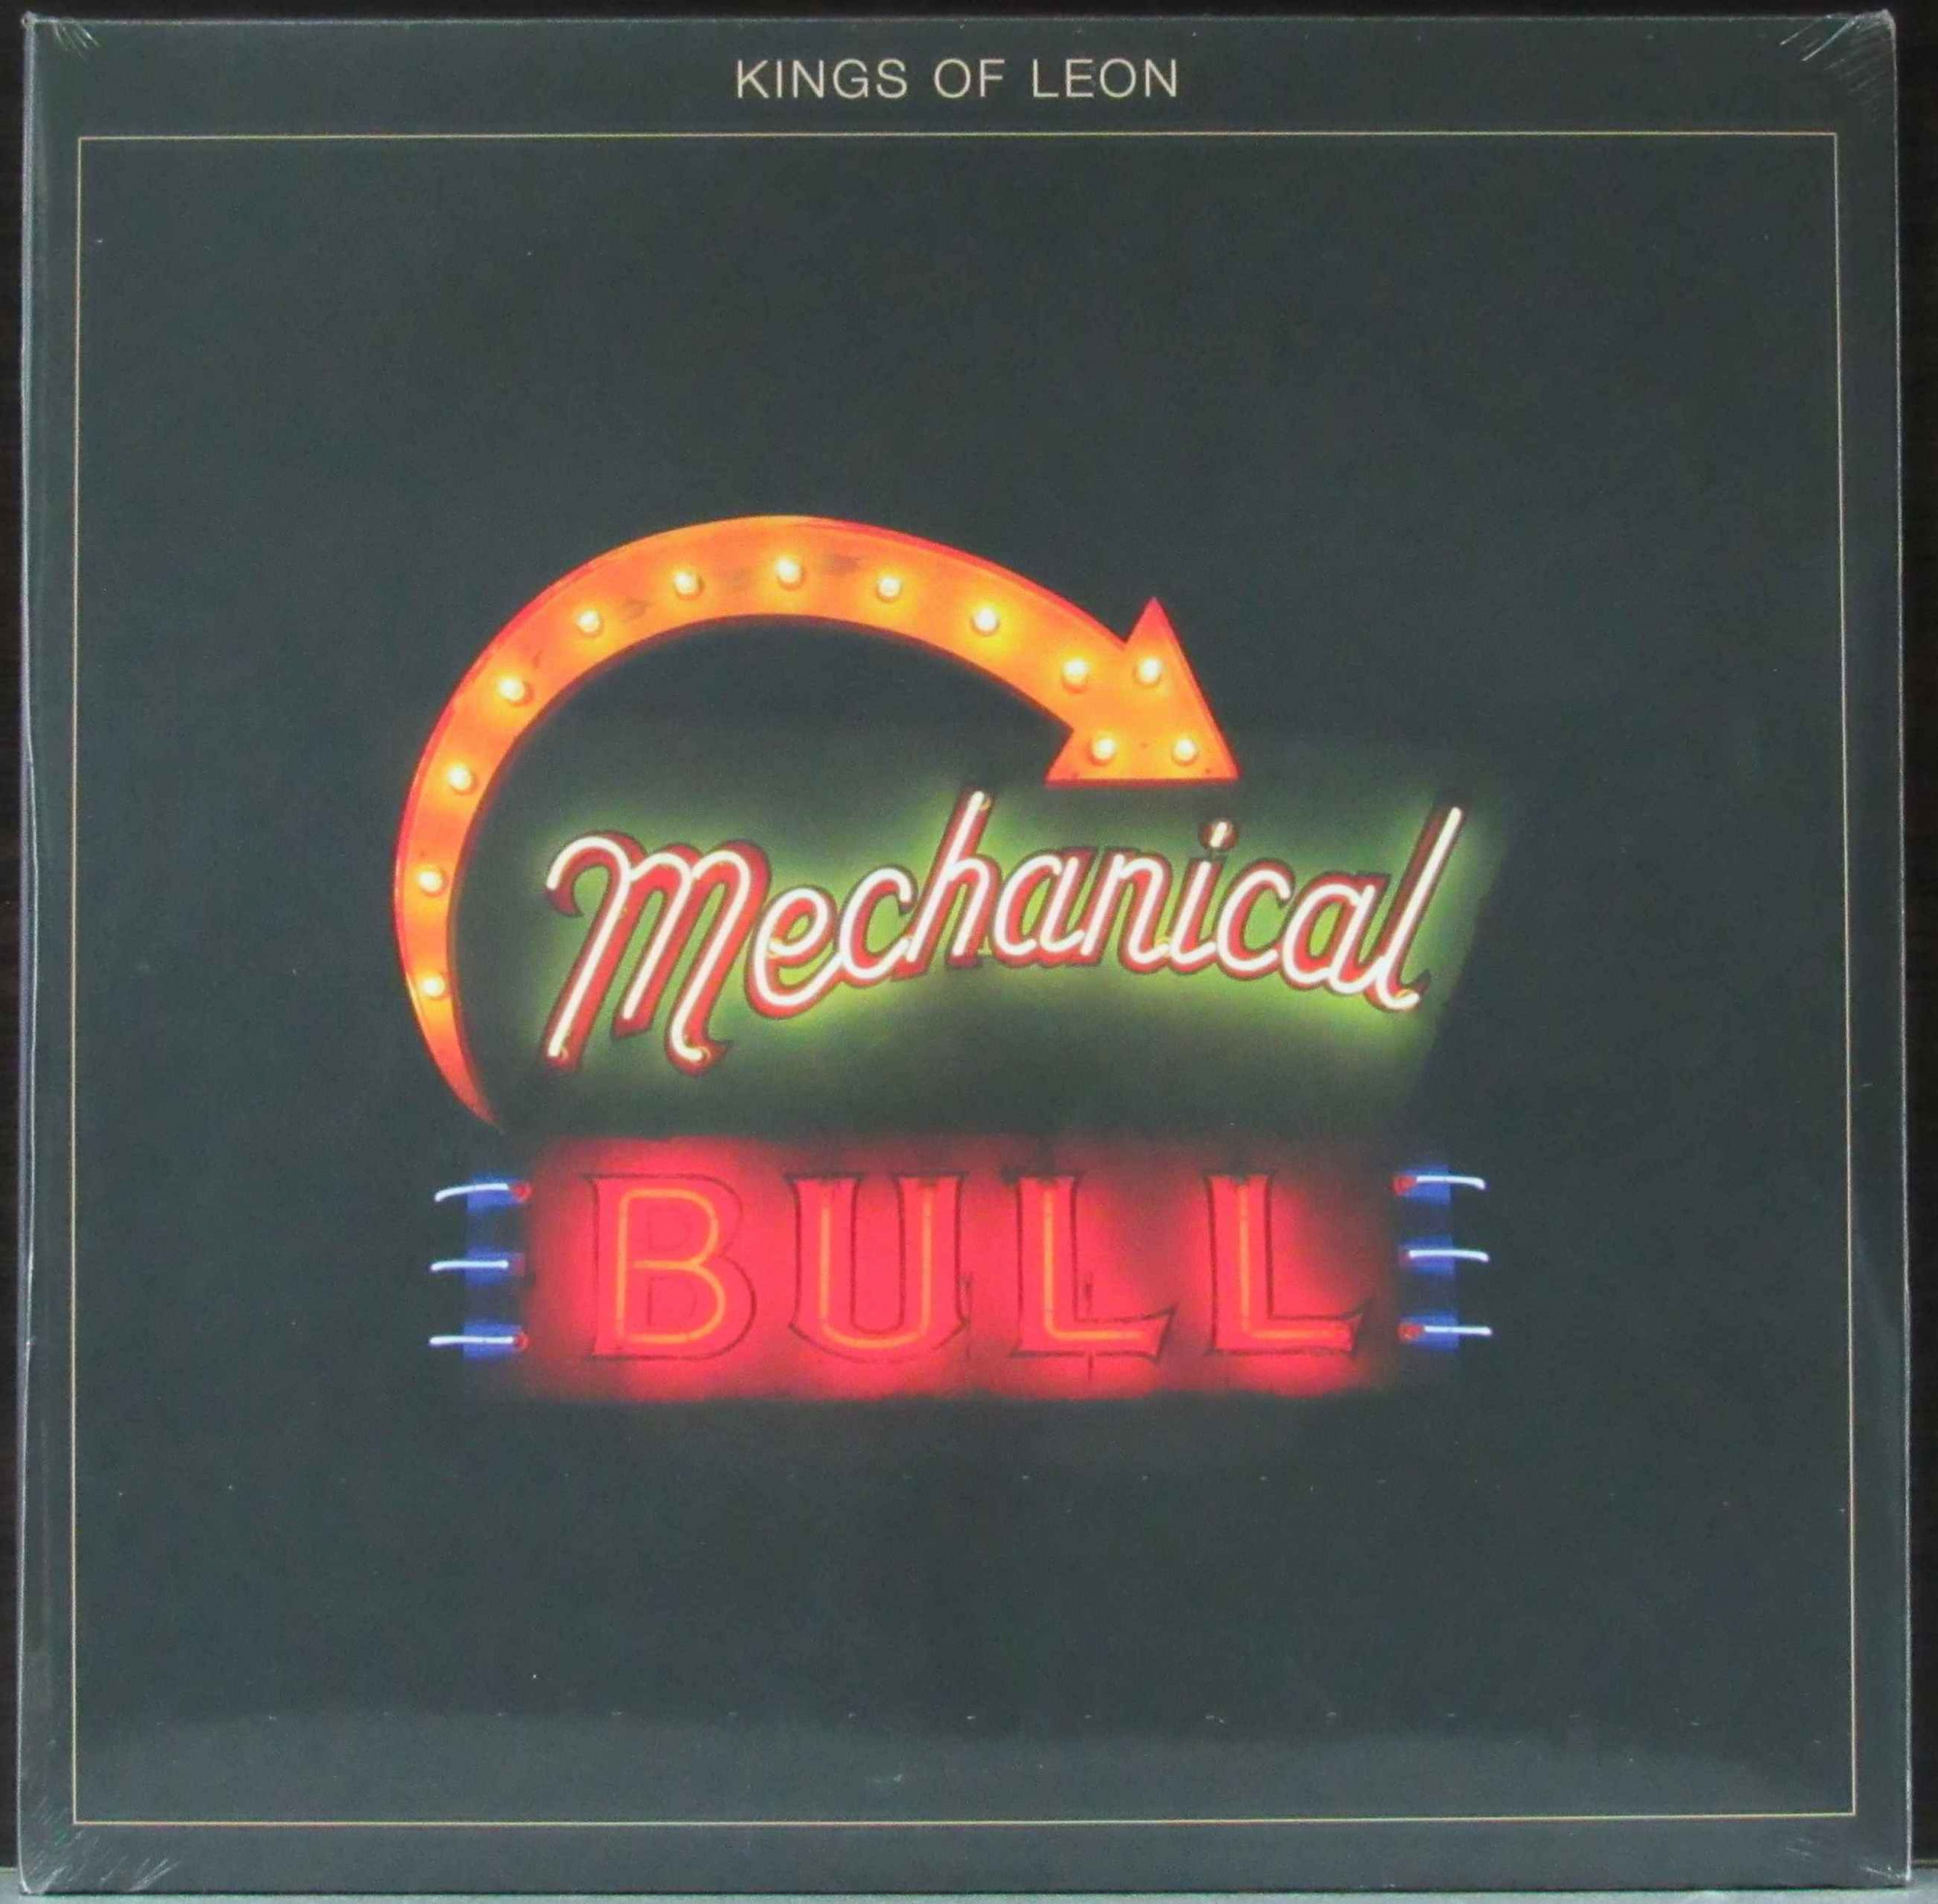 Kings Of LeonВиниловые пластинки<br>Виниловая пластинка<br>